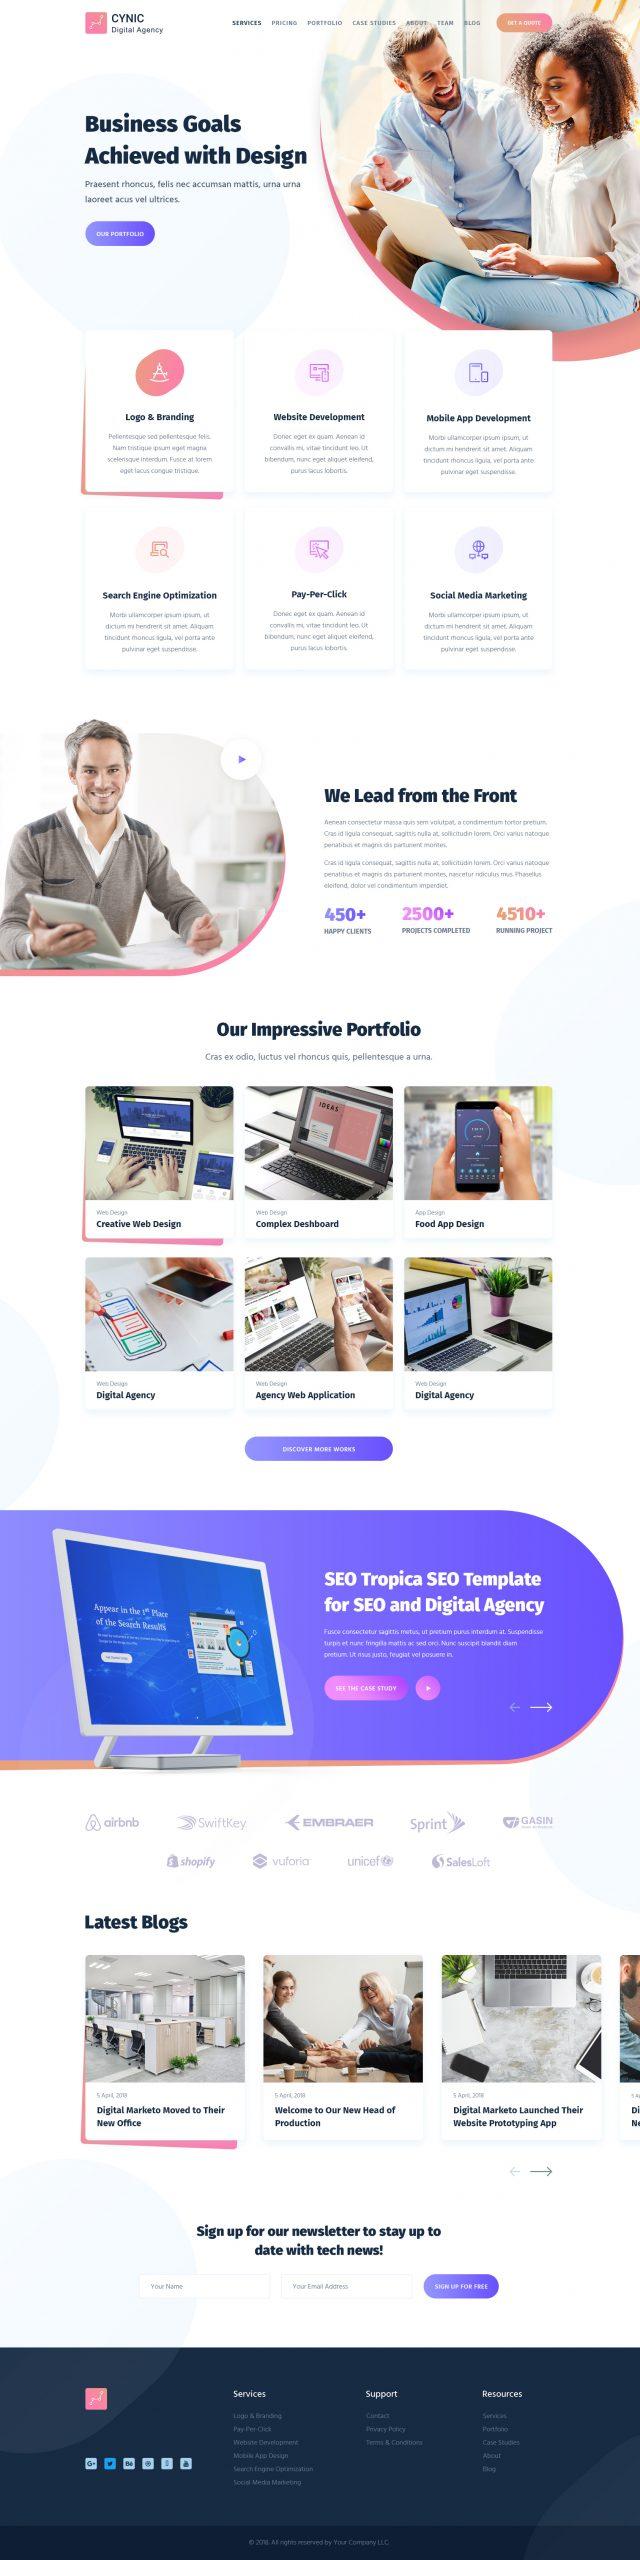 trendy-small-digital-agency